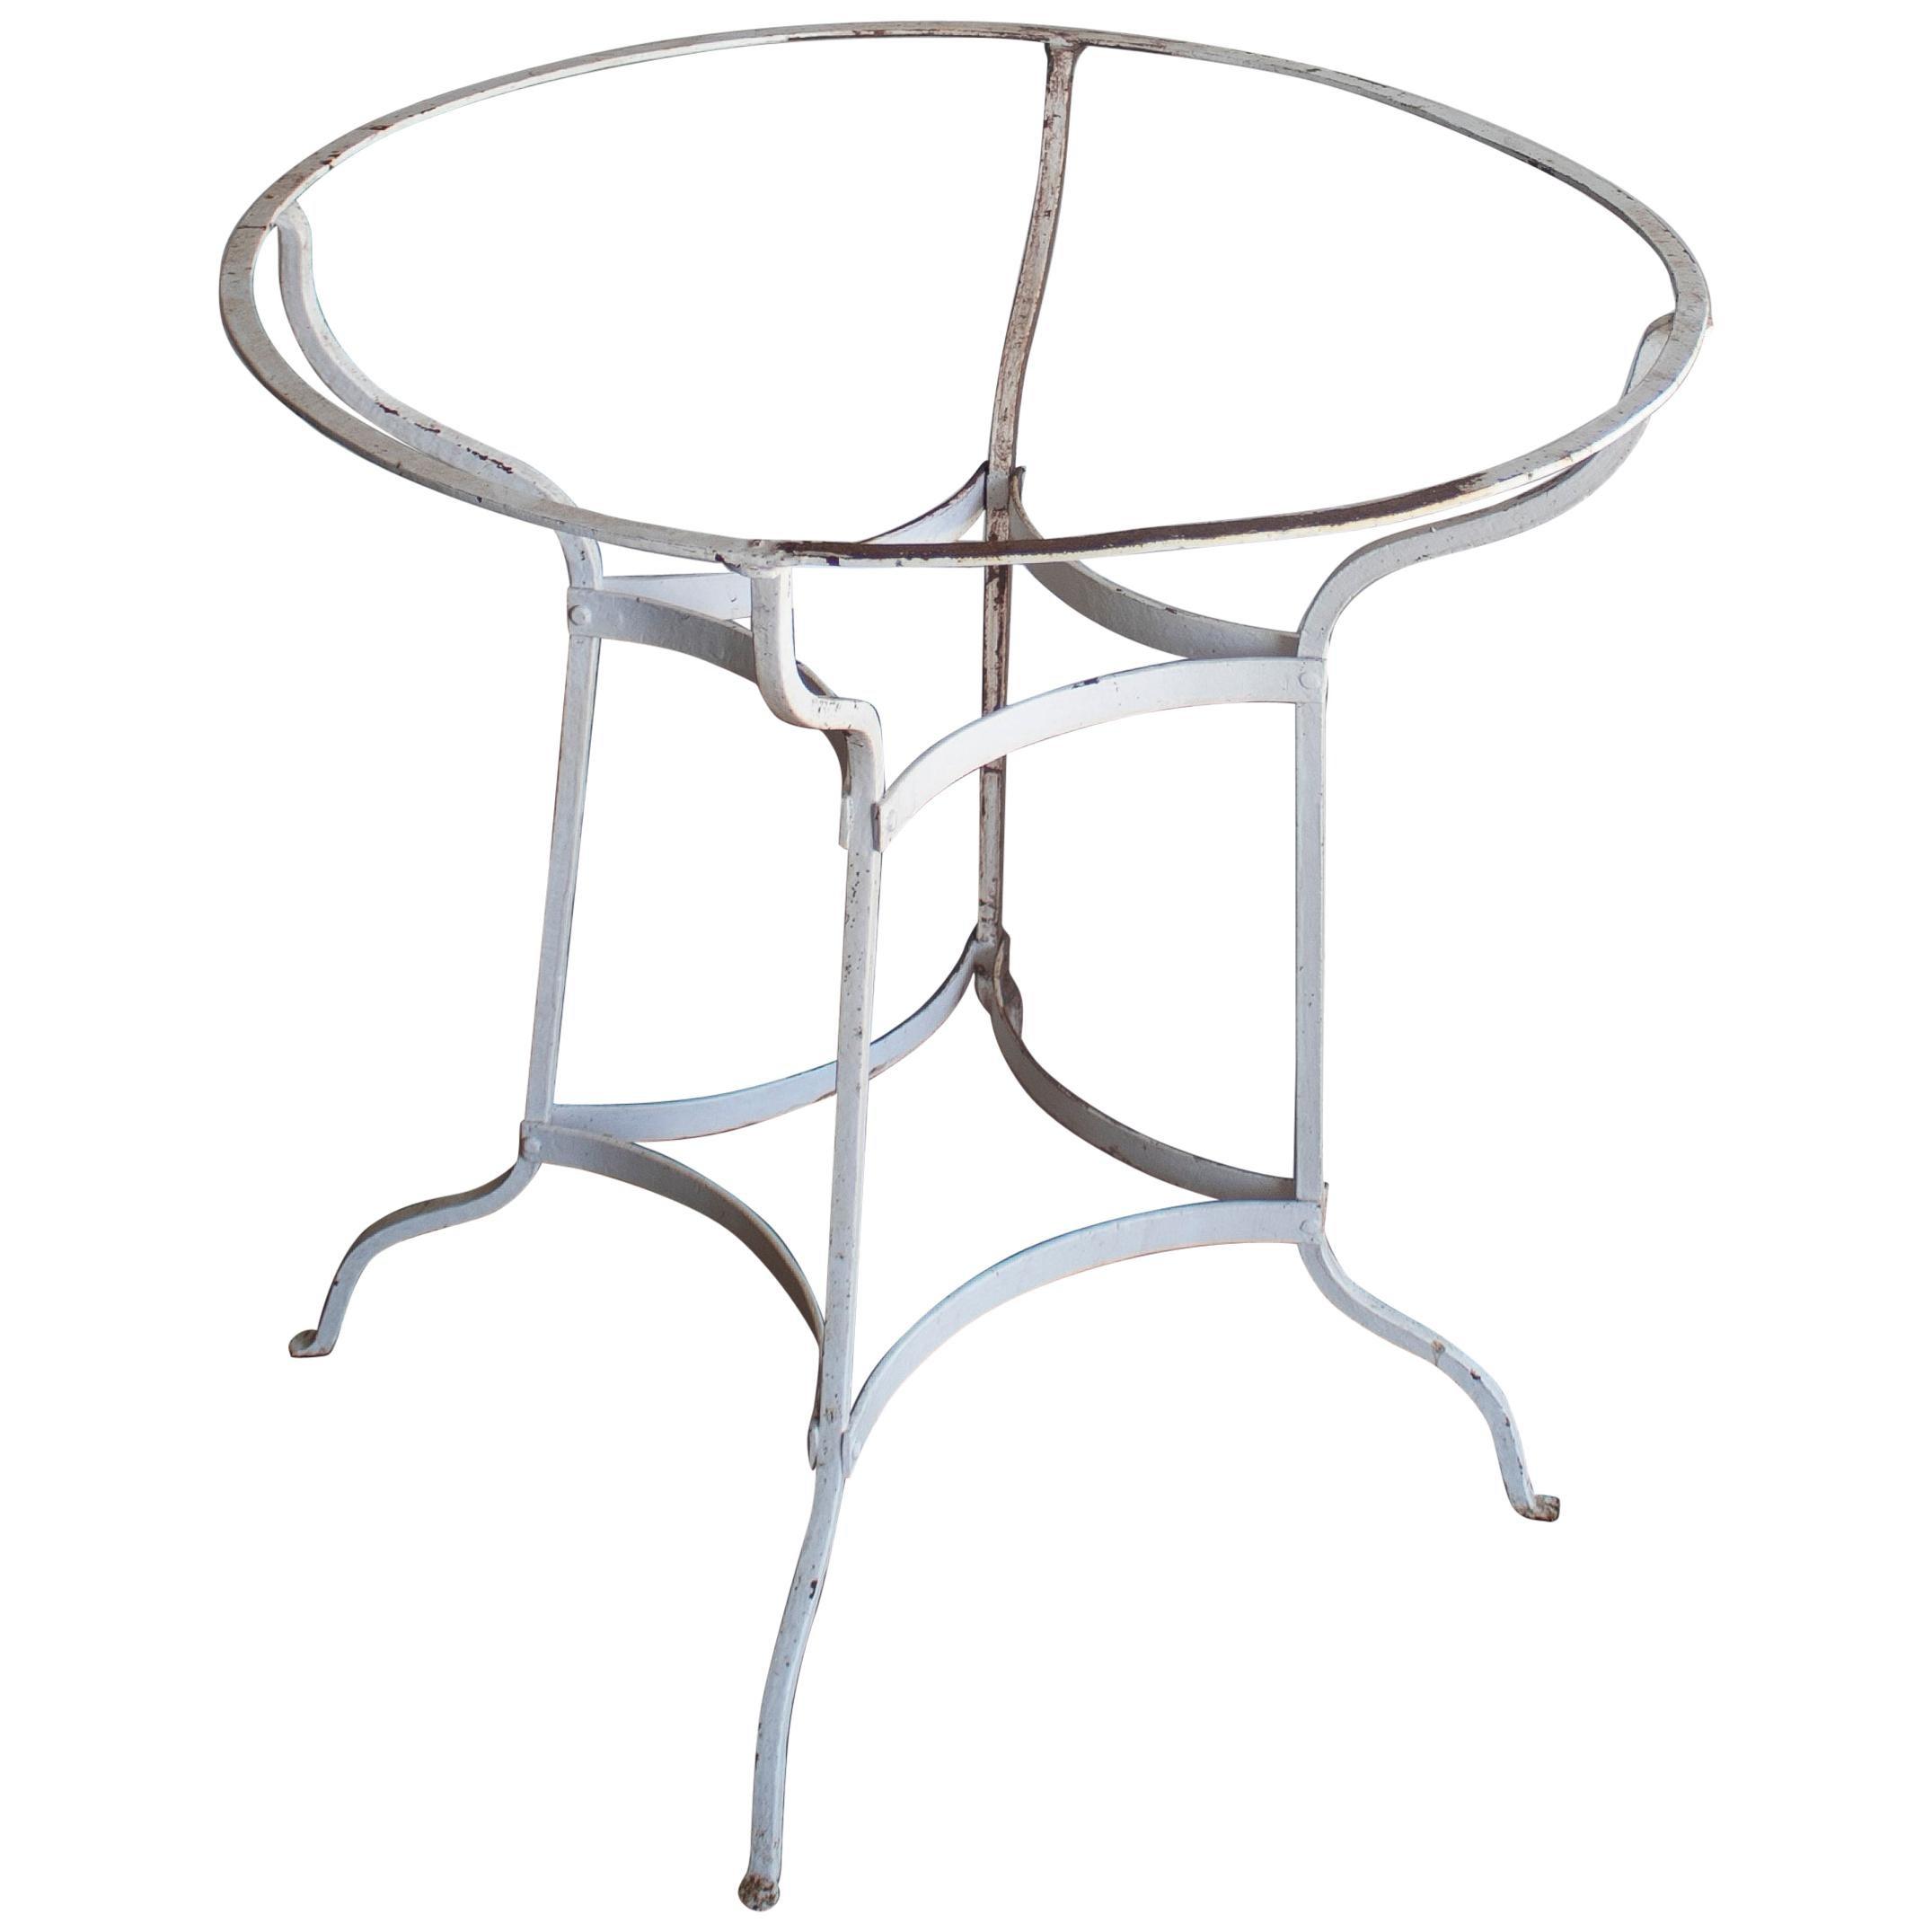 1950s Spanish Iron Garden Table Base